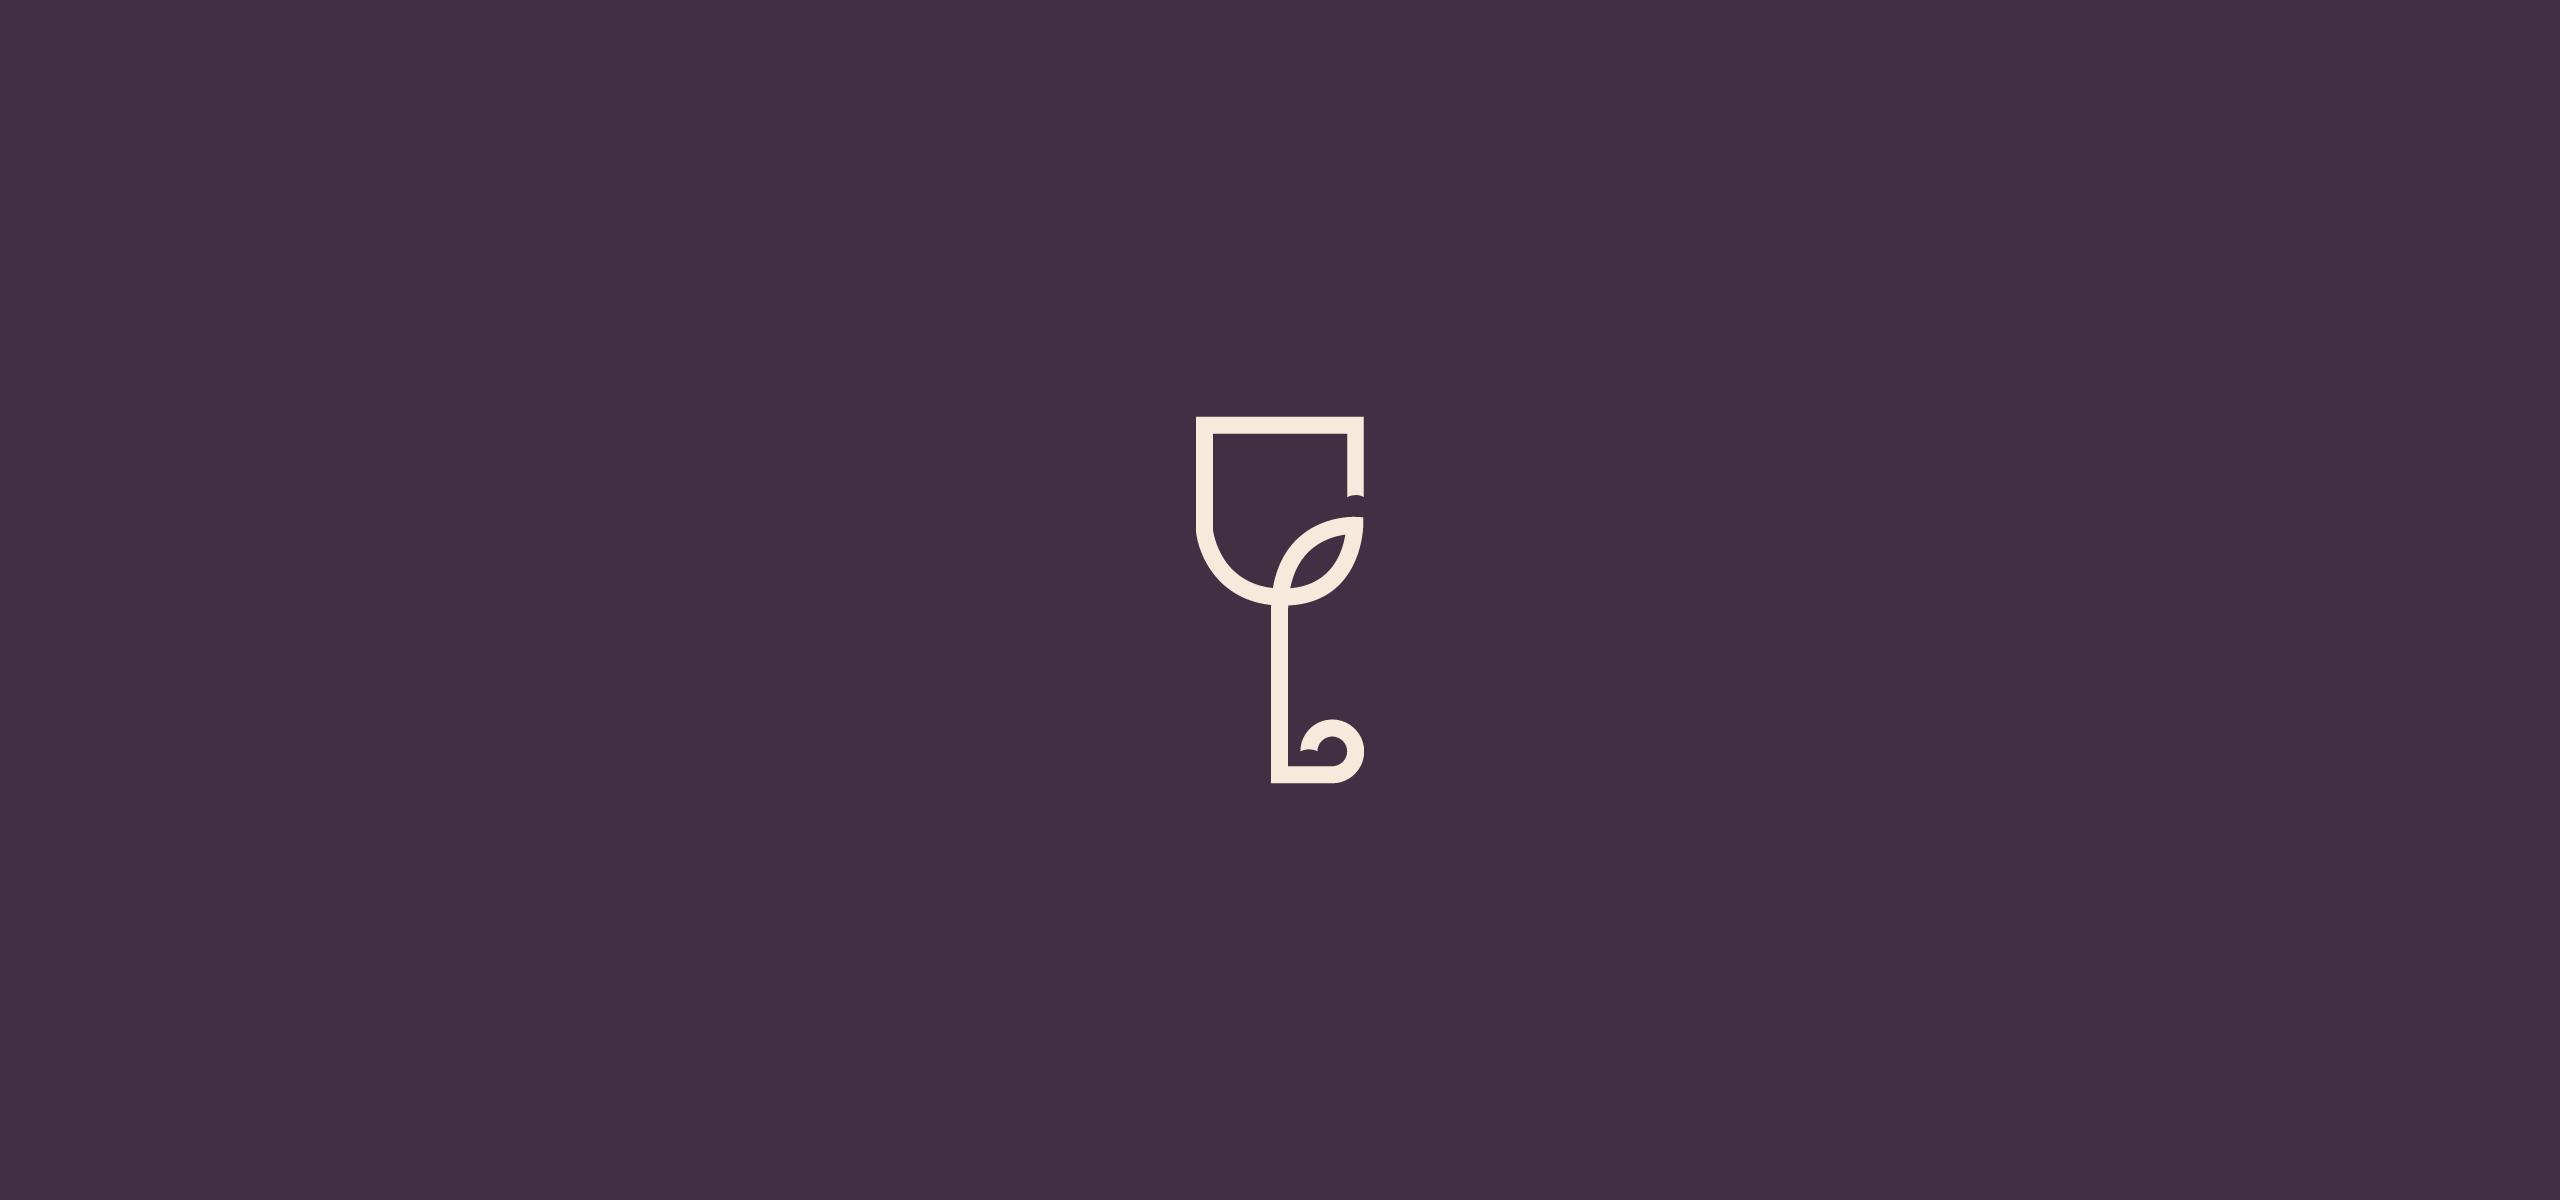 Wine Wholesaler and Importer Company Limited Company Logo, Symbol